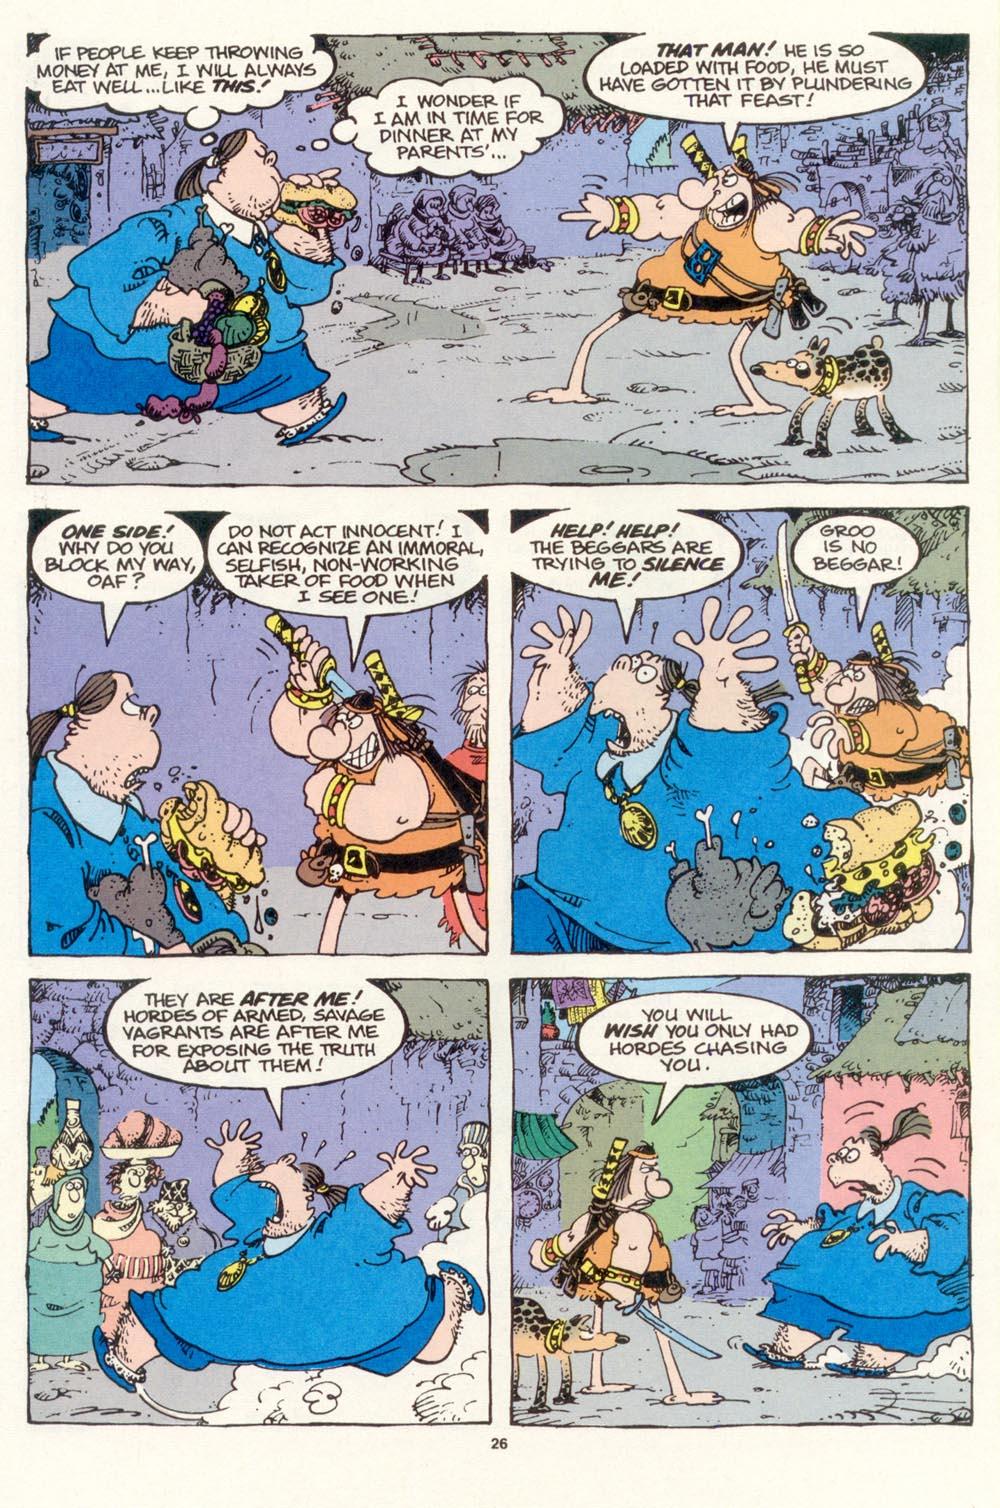 Read online Sergio Aragonés Groo the Wanderer comic -  Issue #118 - 28